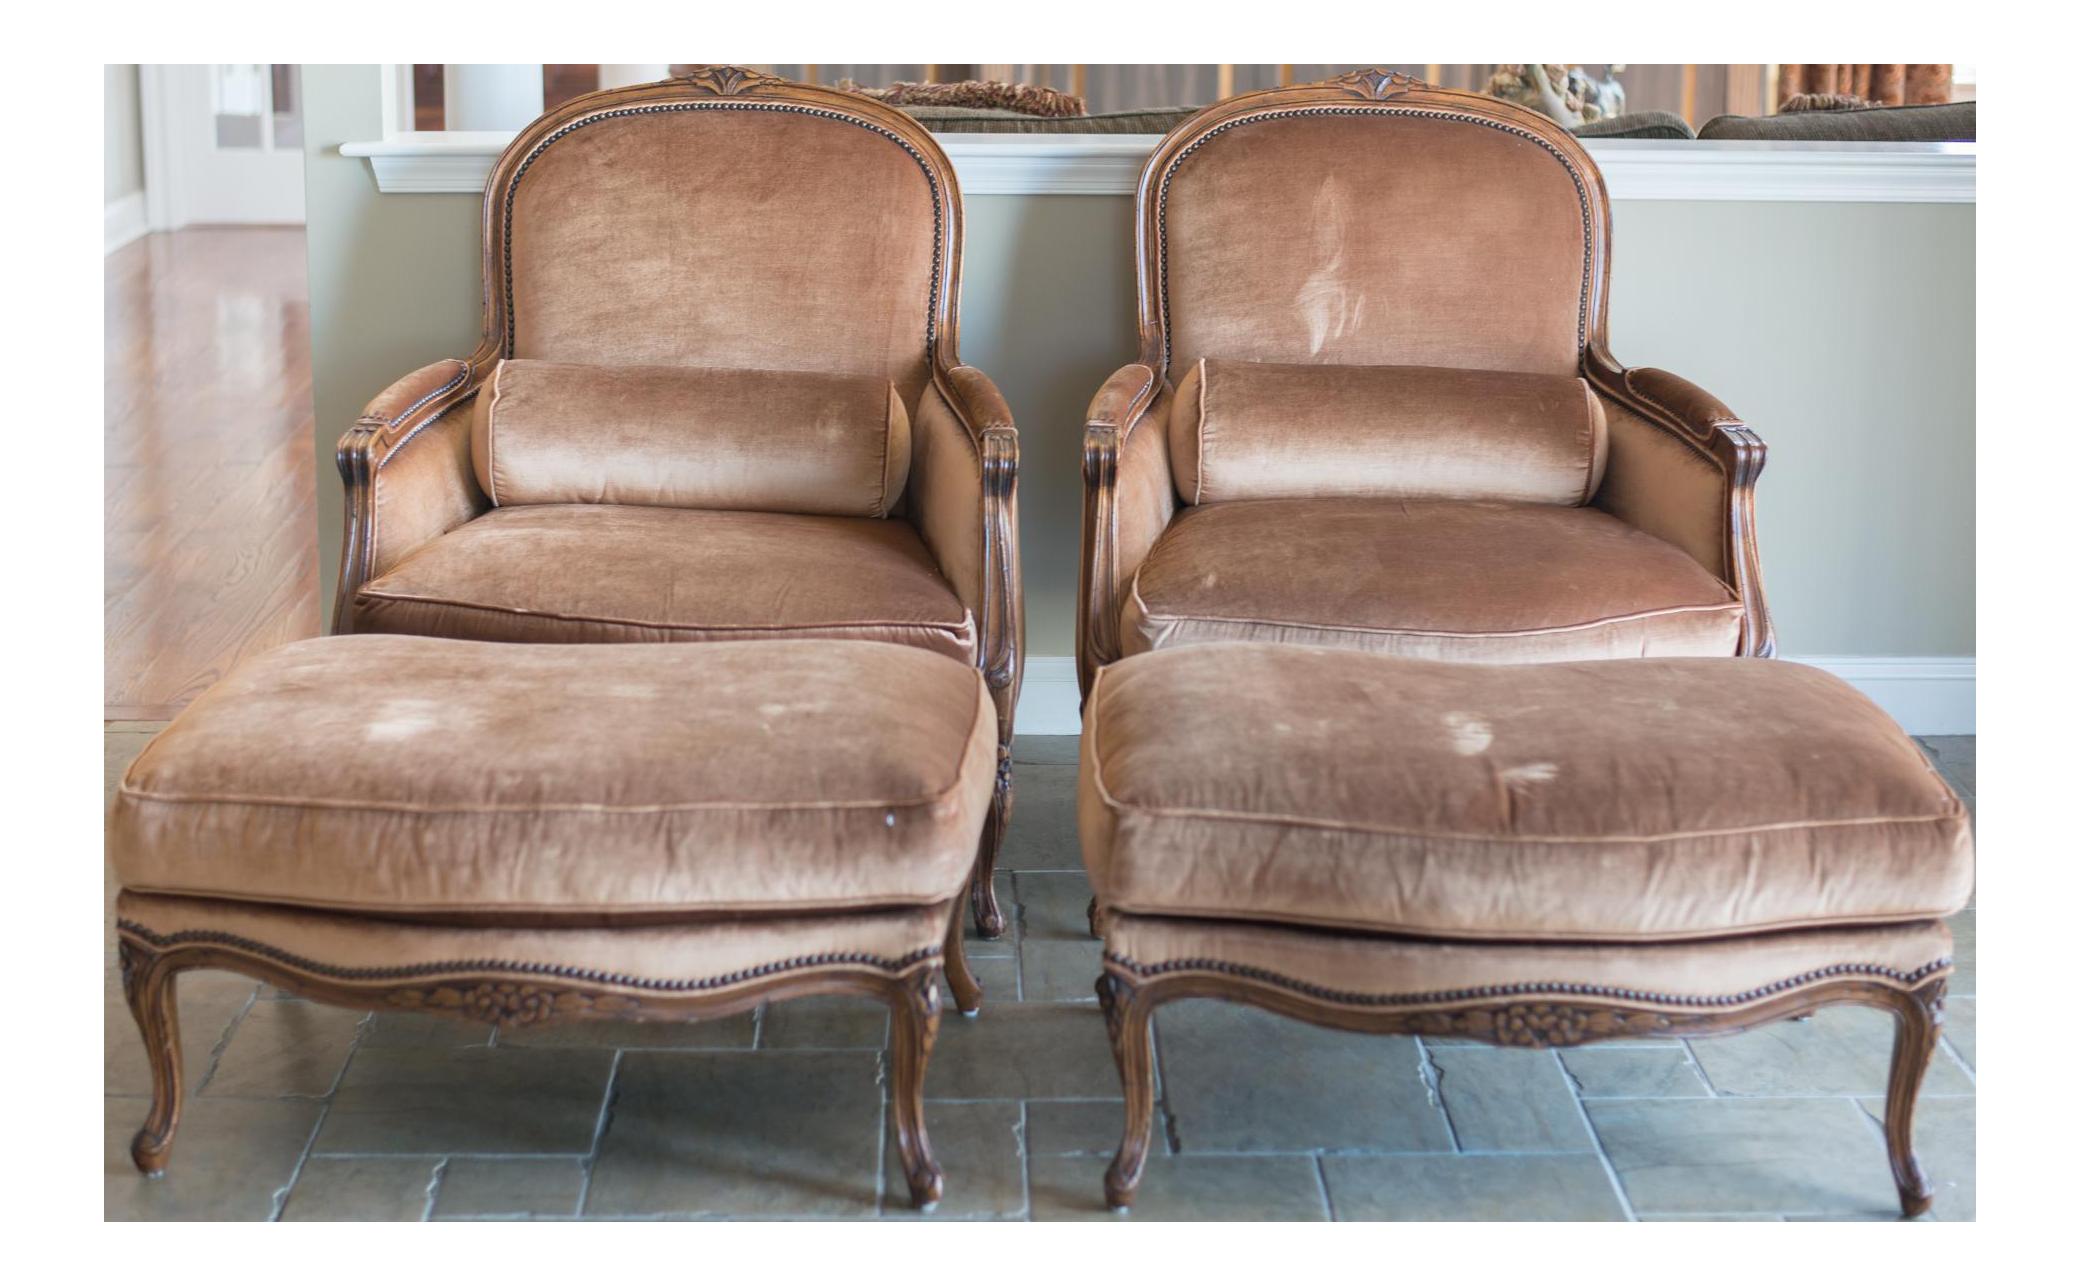 Bergere chair and ottoman - Bergere Chair And Ottoman 40